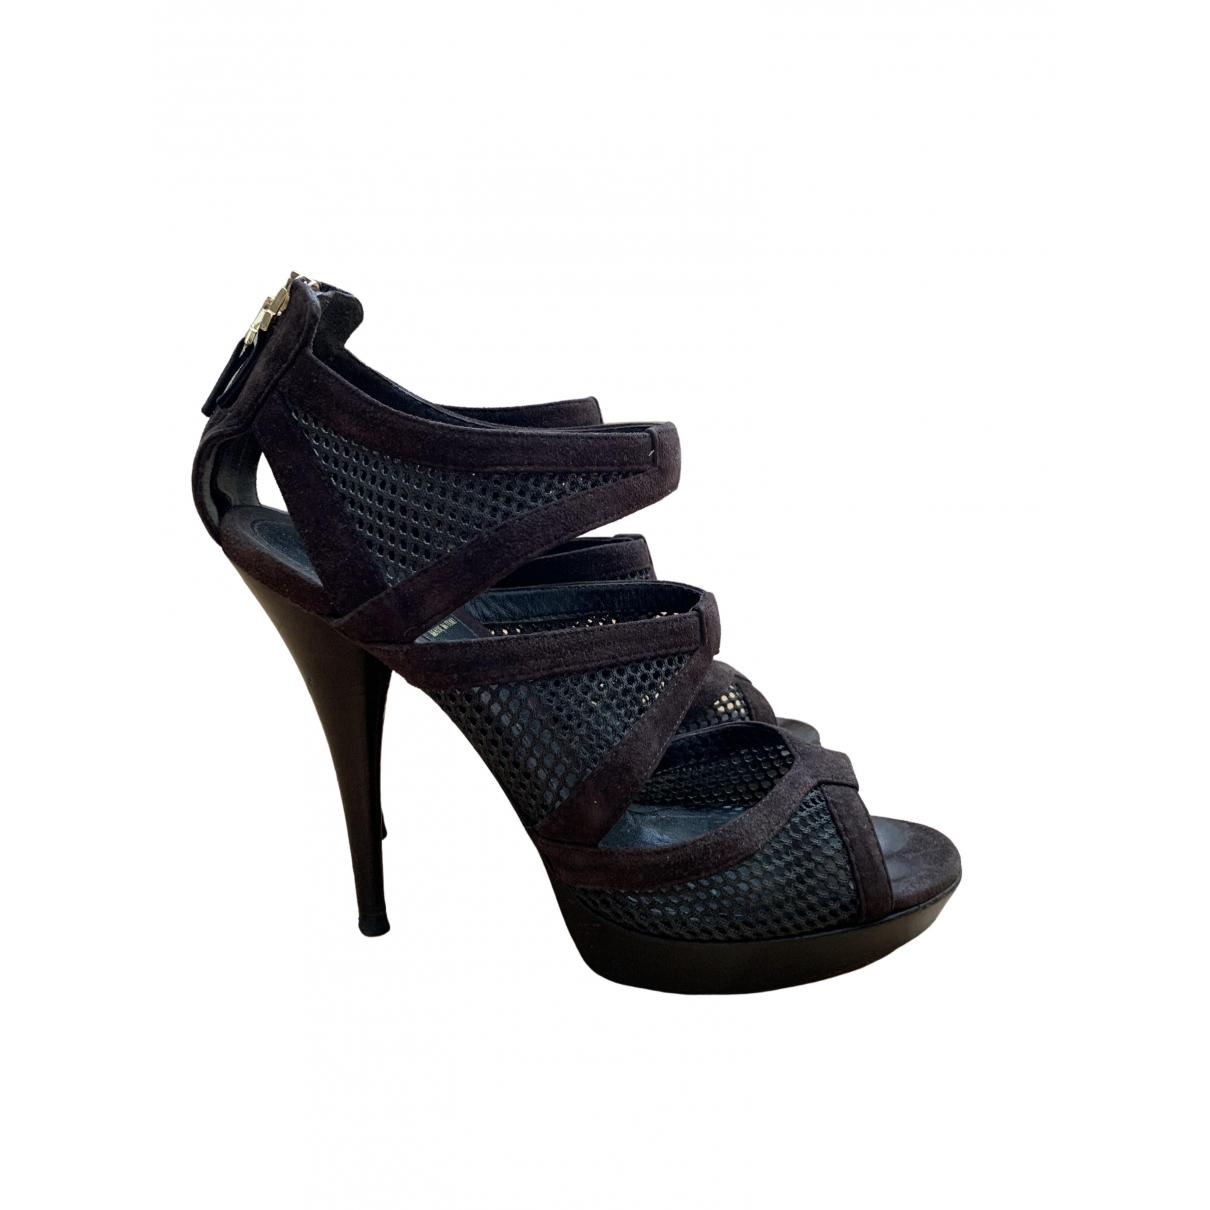 Fendi \N Brown Suede Sandals for Women 39.5 EU